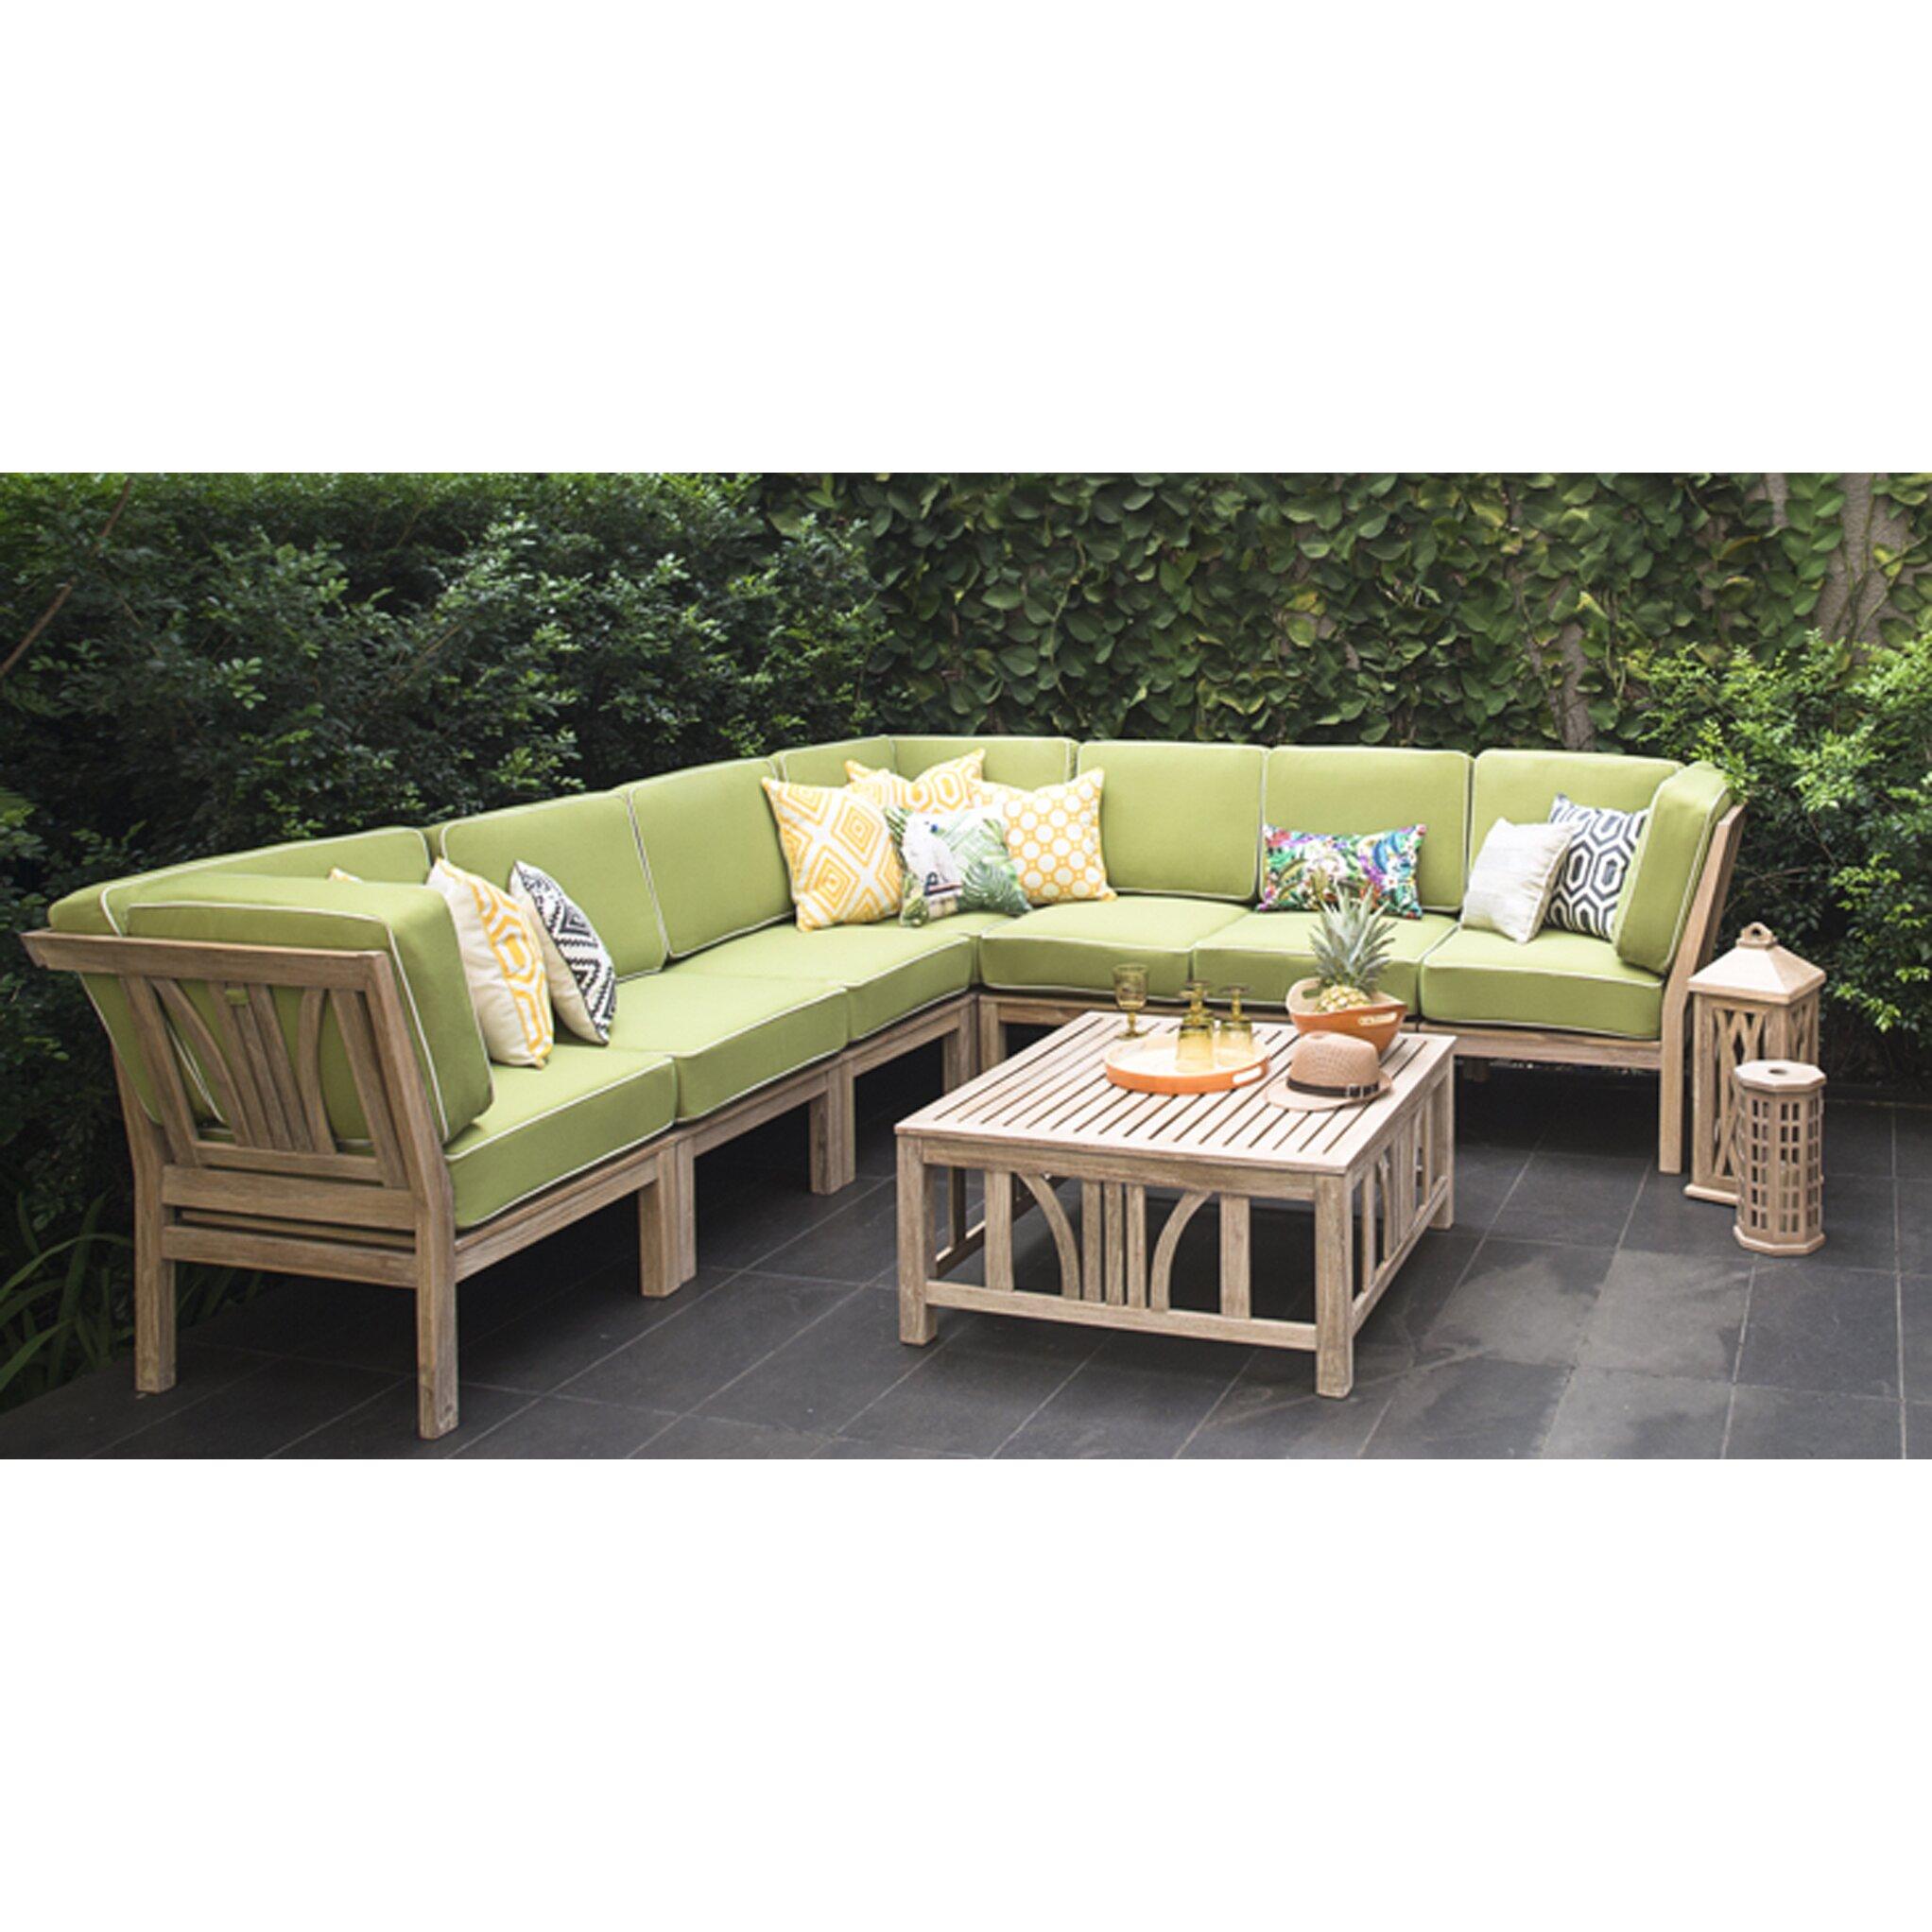 Kensington Corner Lounge Chair With Cushions